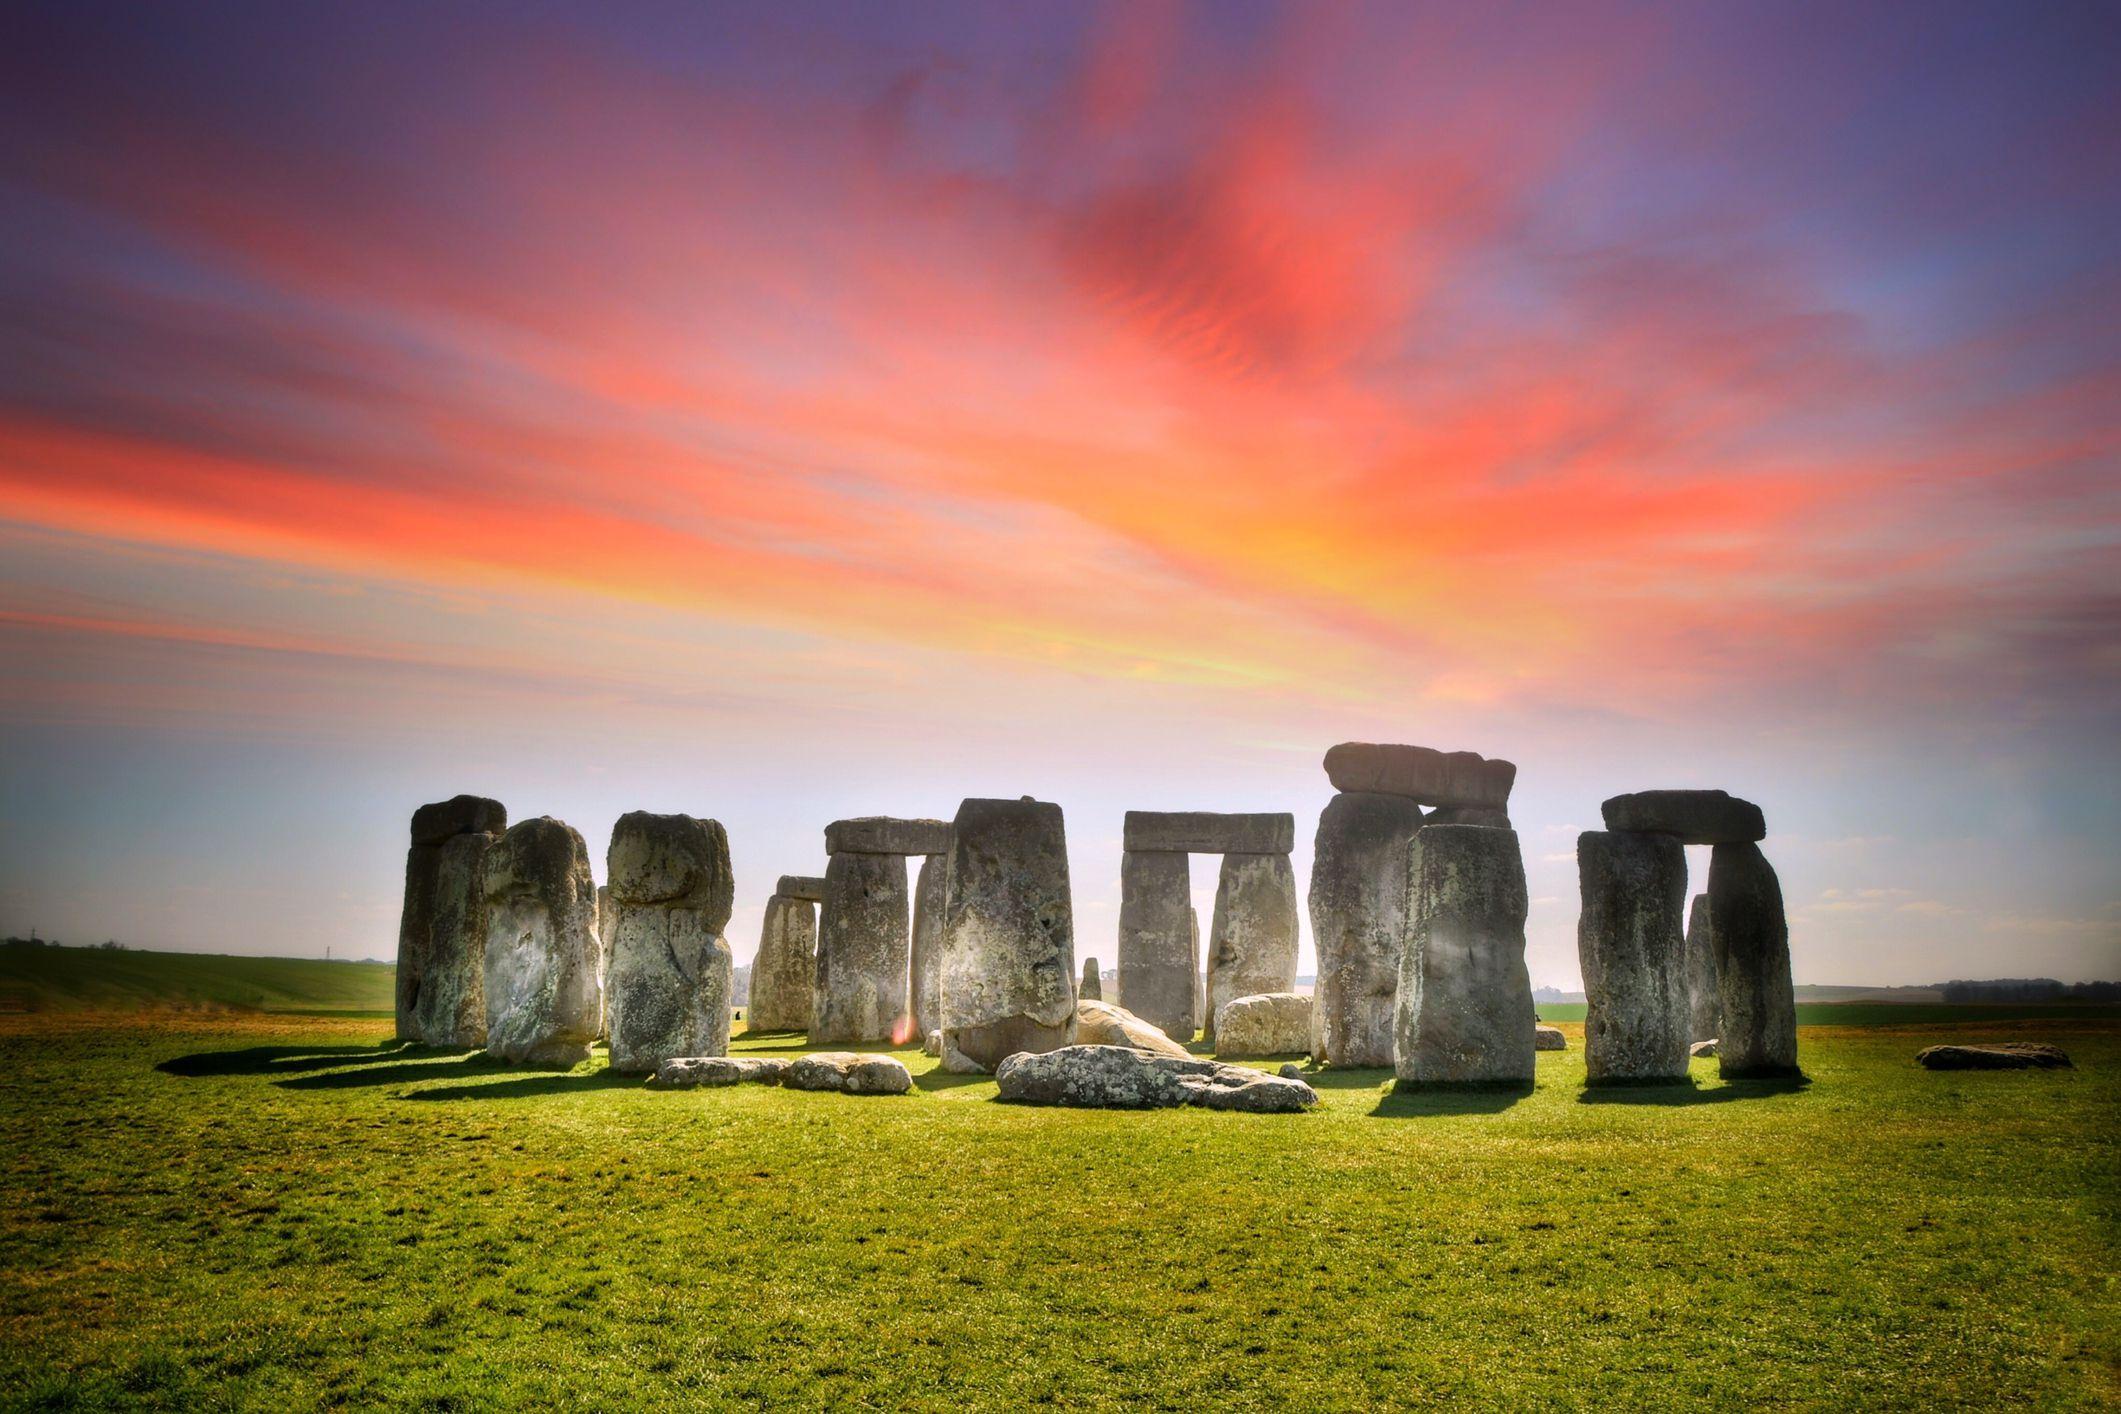 HAPPY SUMMER SOLSTICE Stonehenge-5bad477446e0fb00260524f1